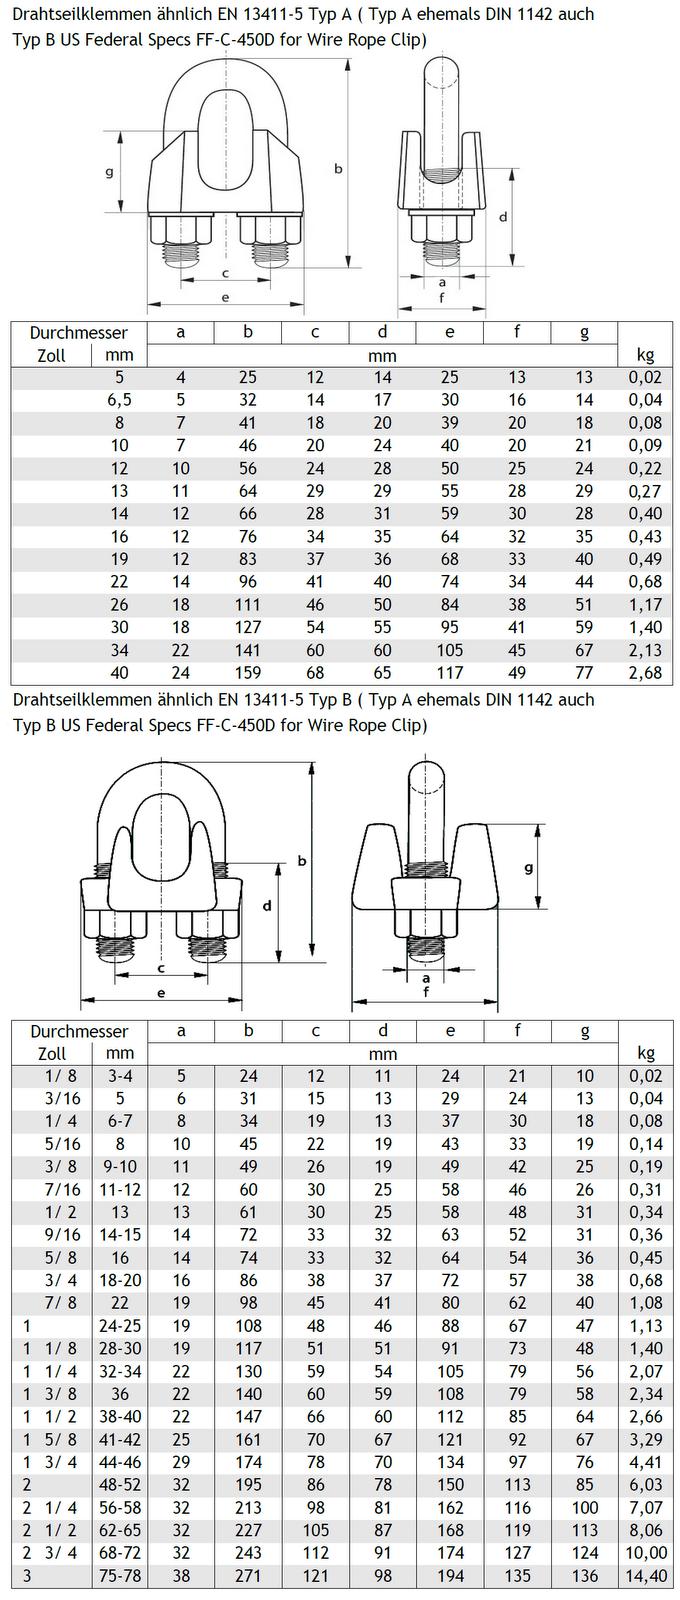 braant drahtseil: Sicherheits-Drahtseilklemmen DIN EN 13411-5